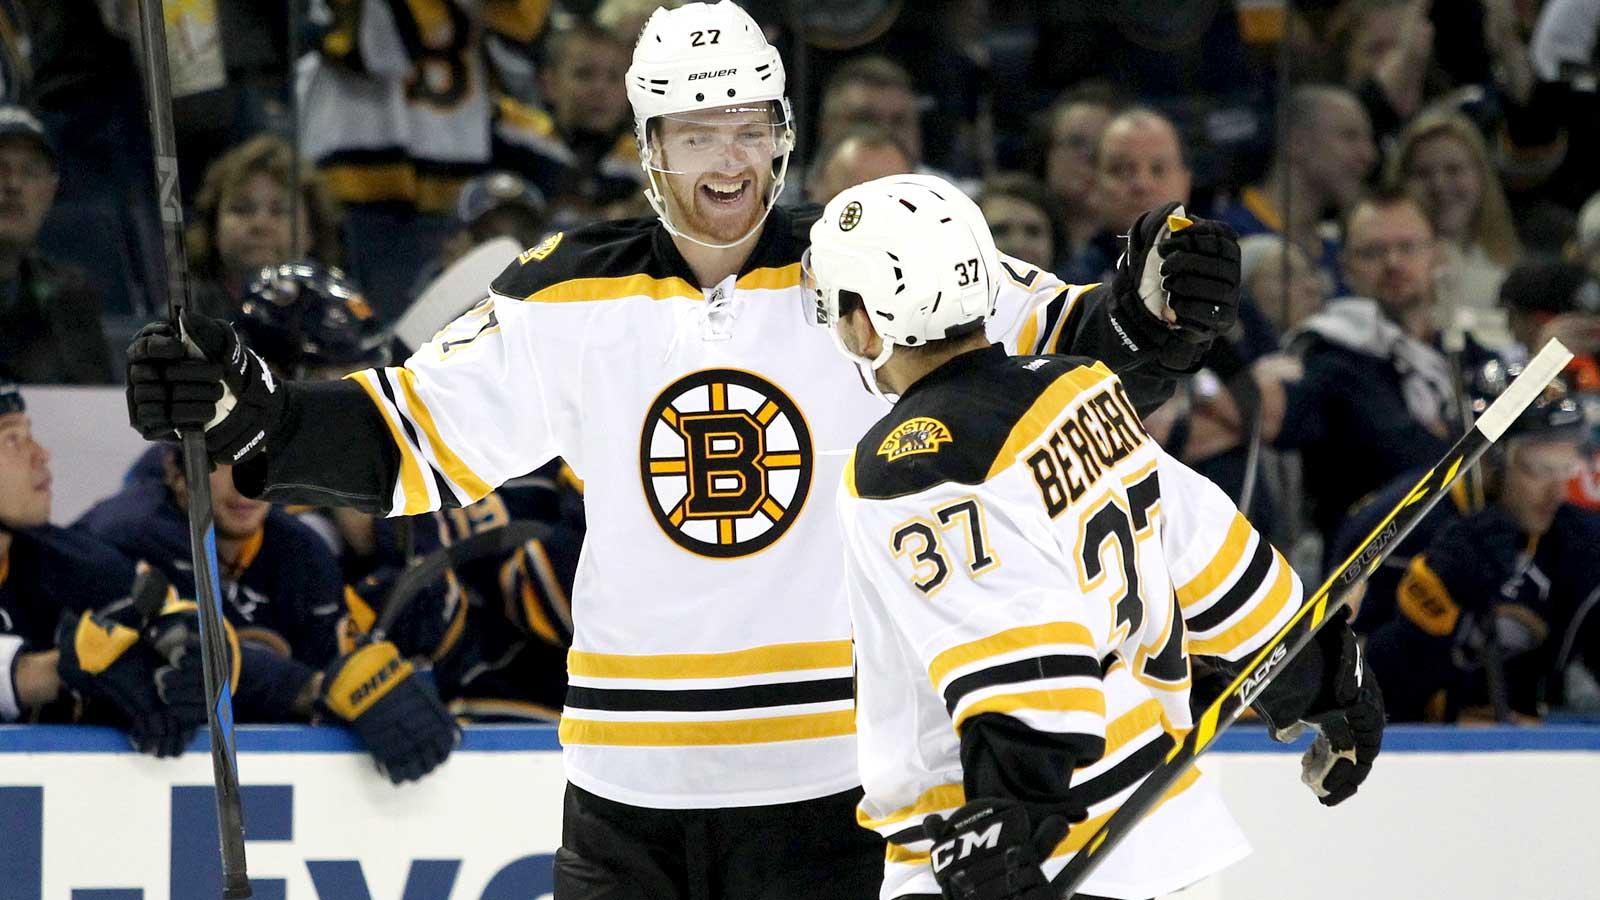 Bruins trade away 'foundational' defenseman for draft picks